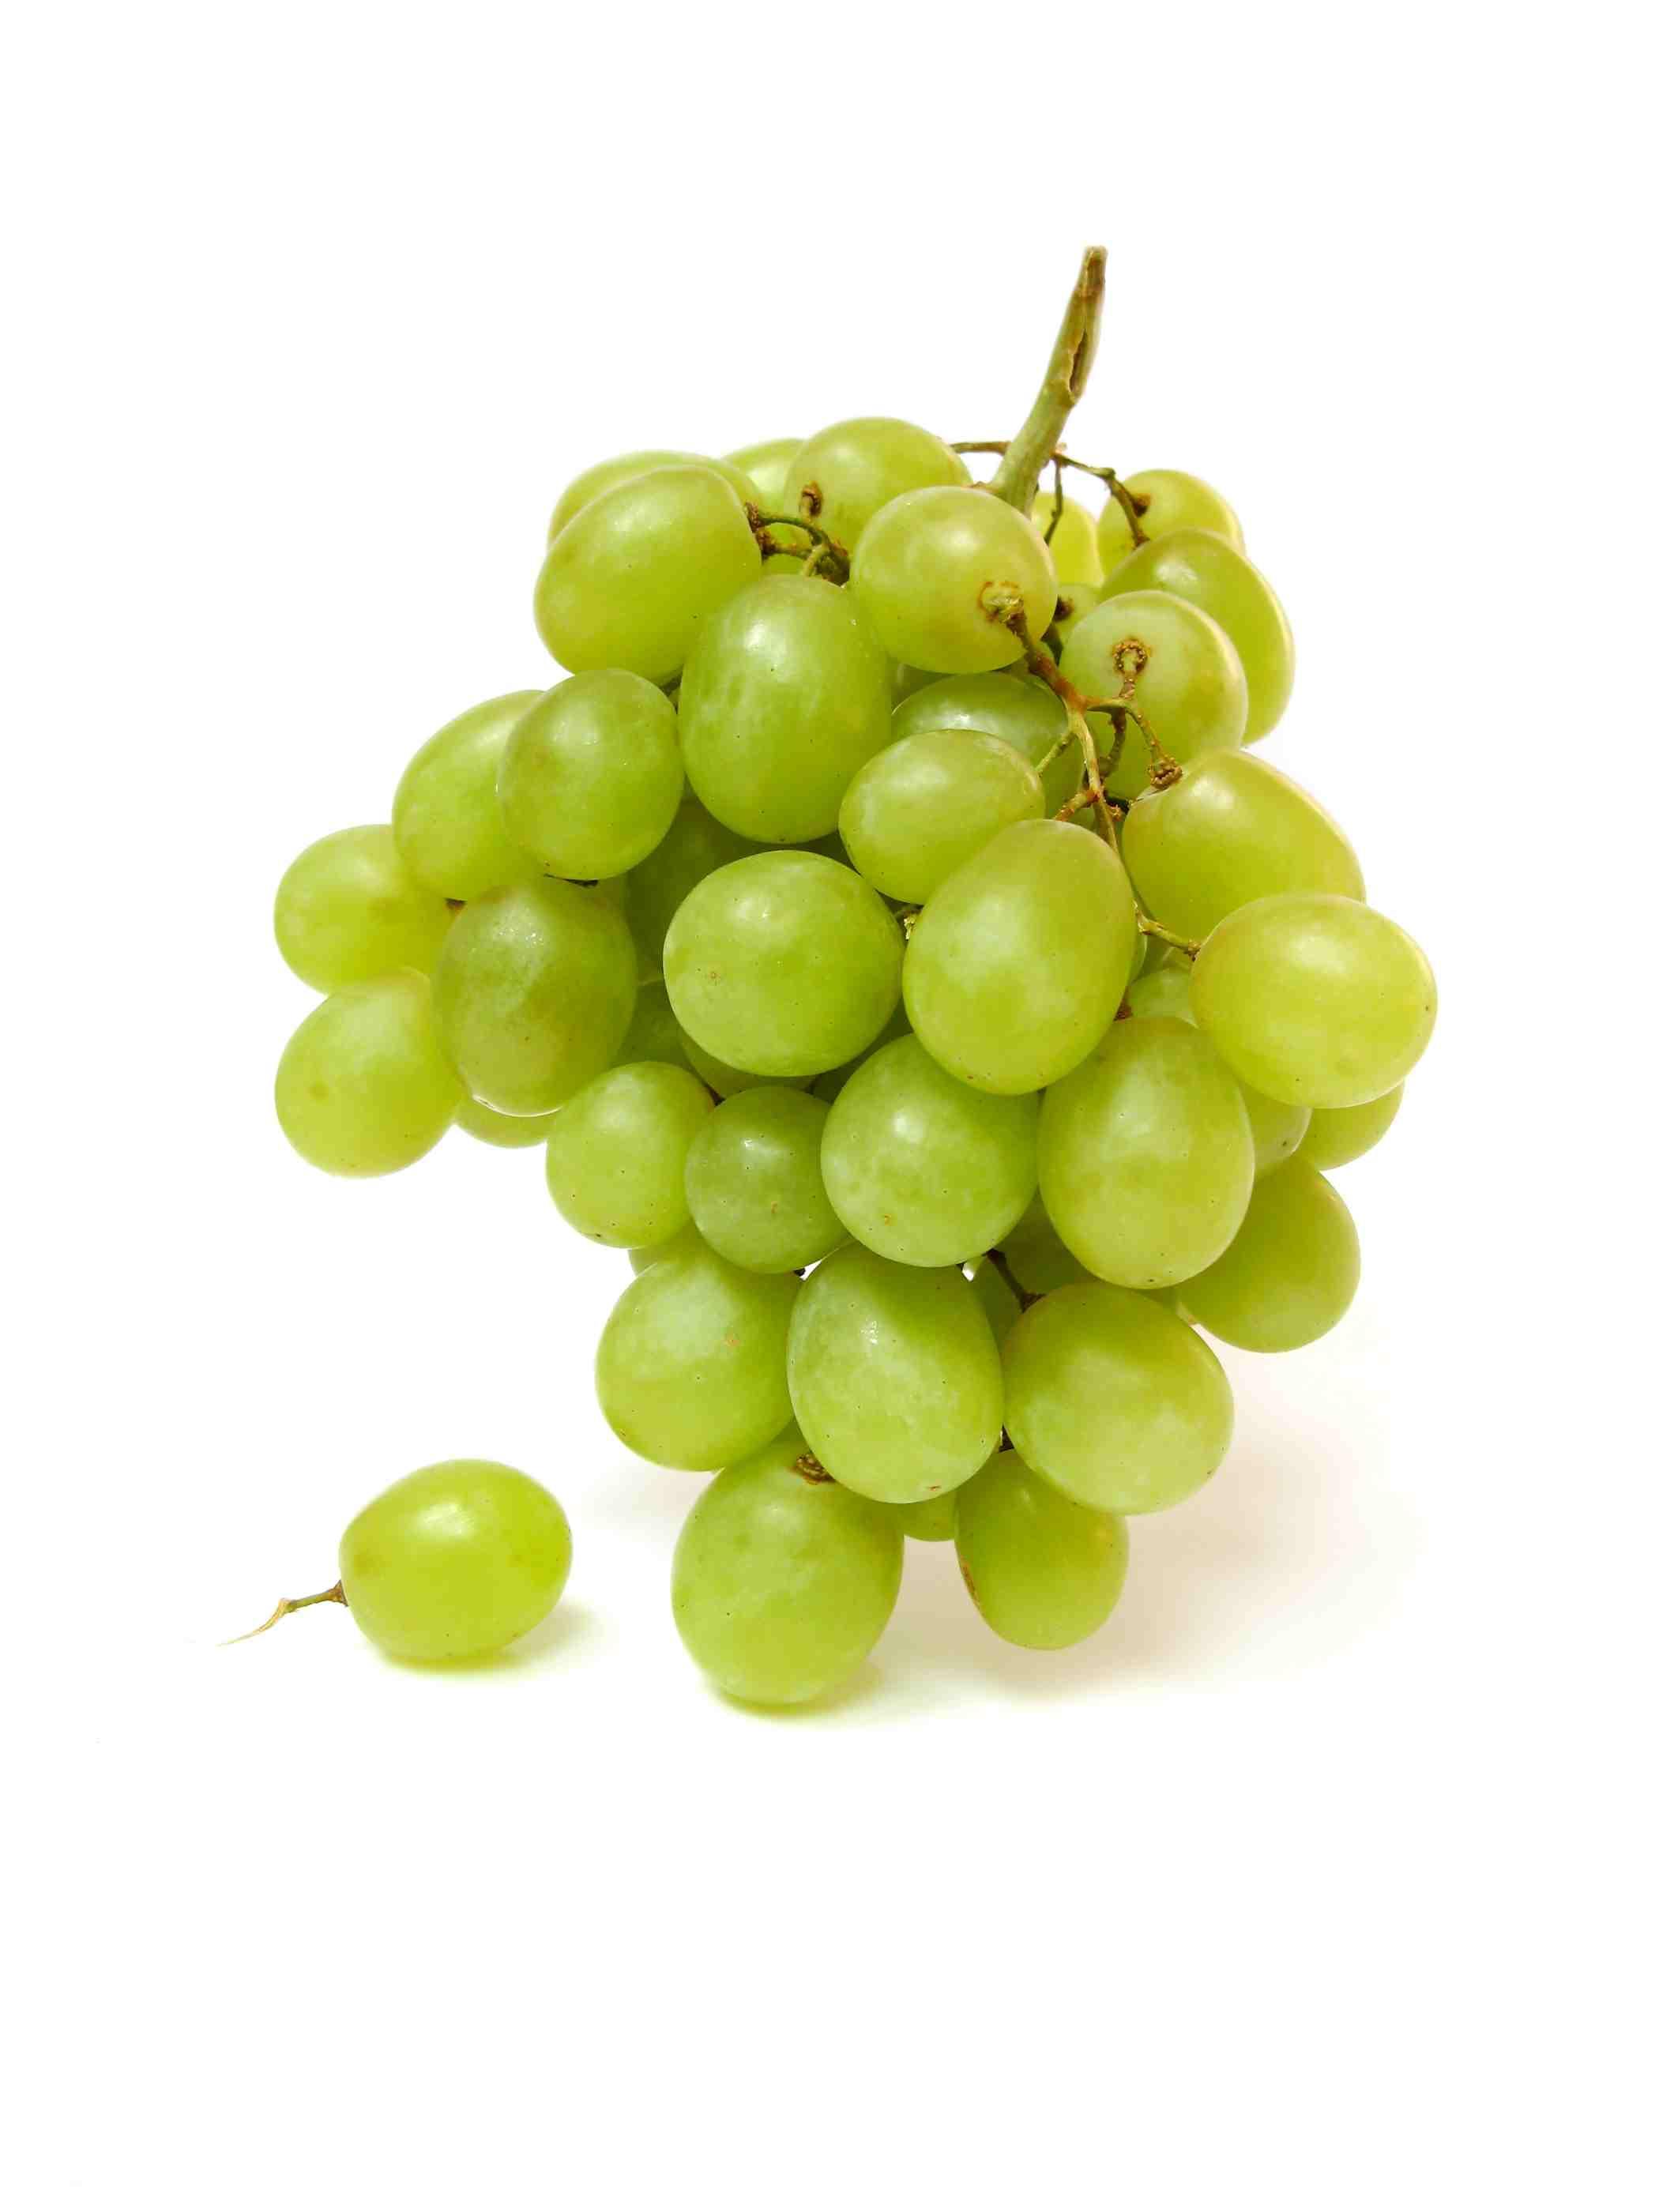 grapes raisin pet dog poison